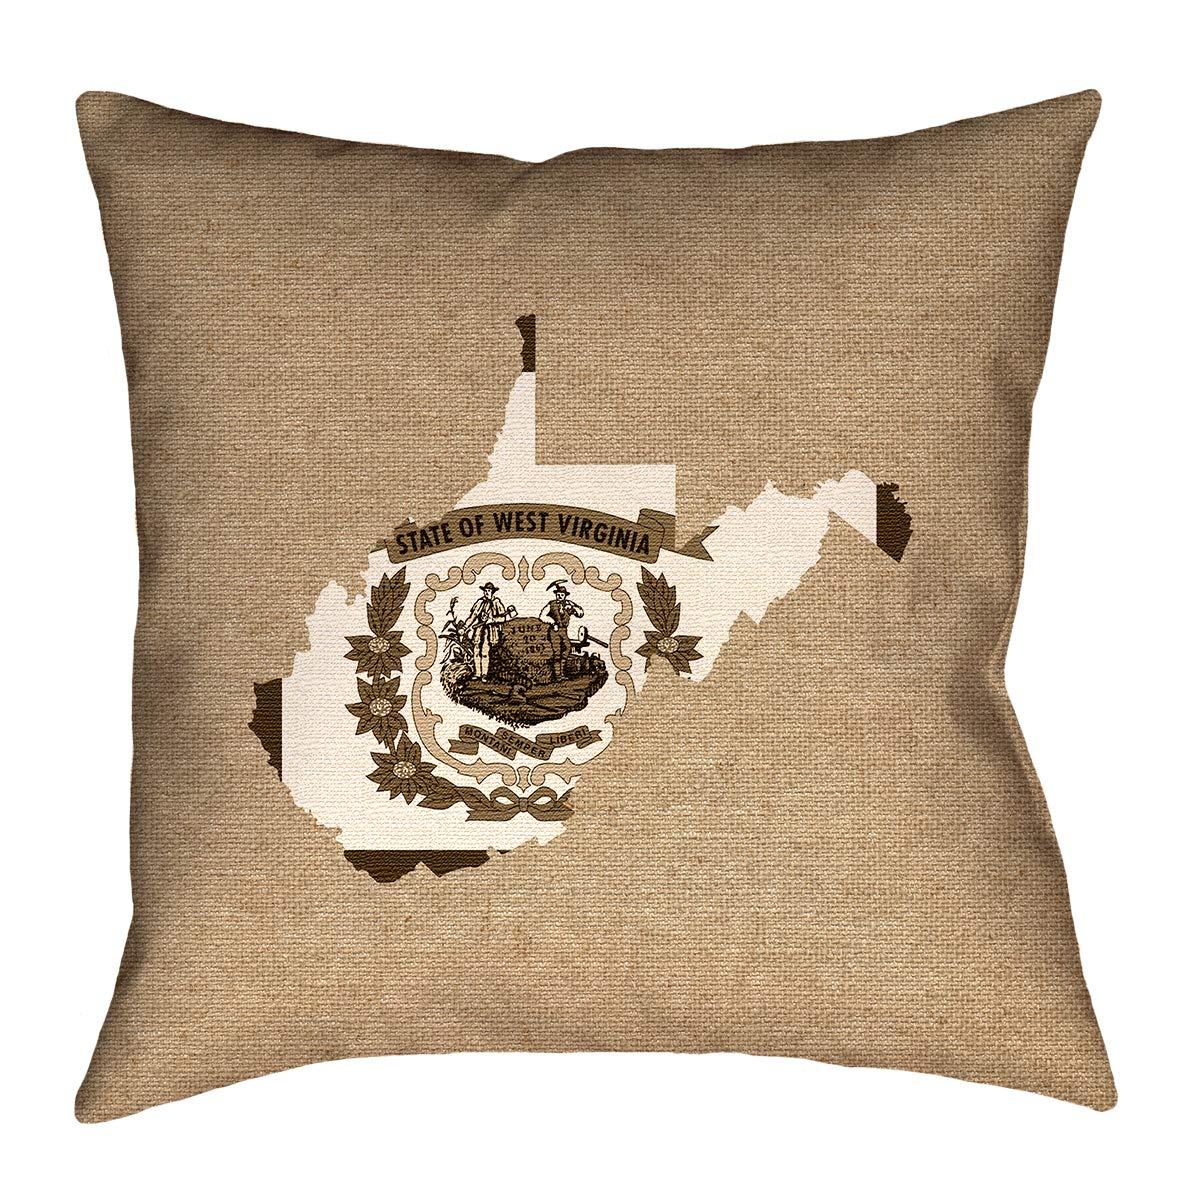 ArtVerse Katelyn Smith 18 x 18 Spun Polyester West Virginia Love Pillow